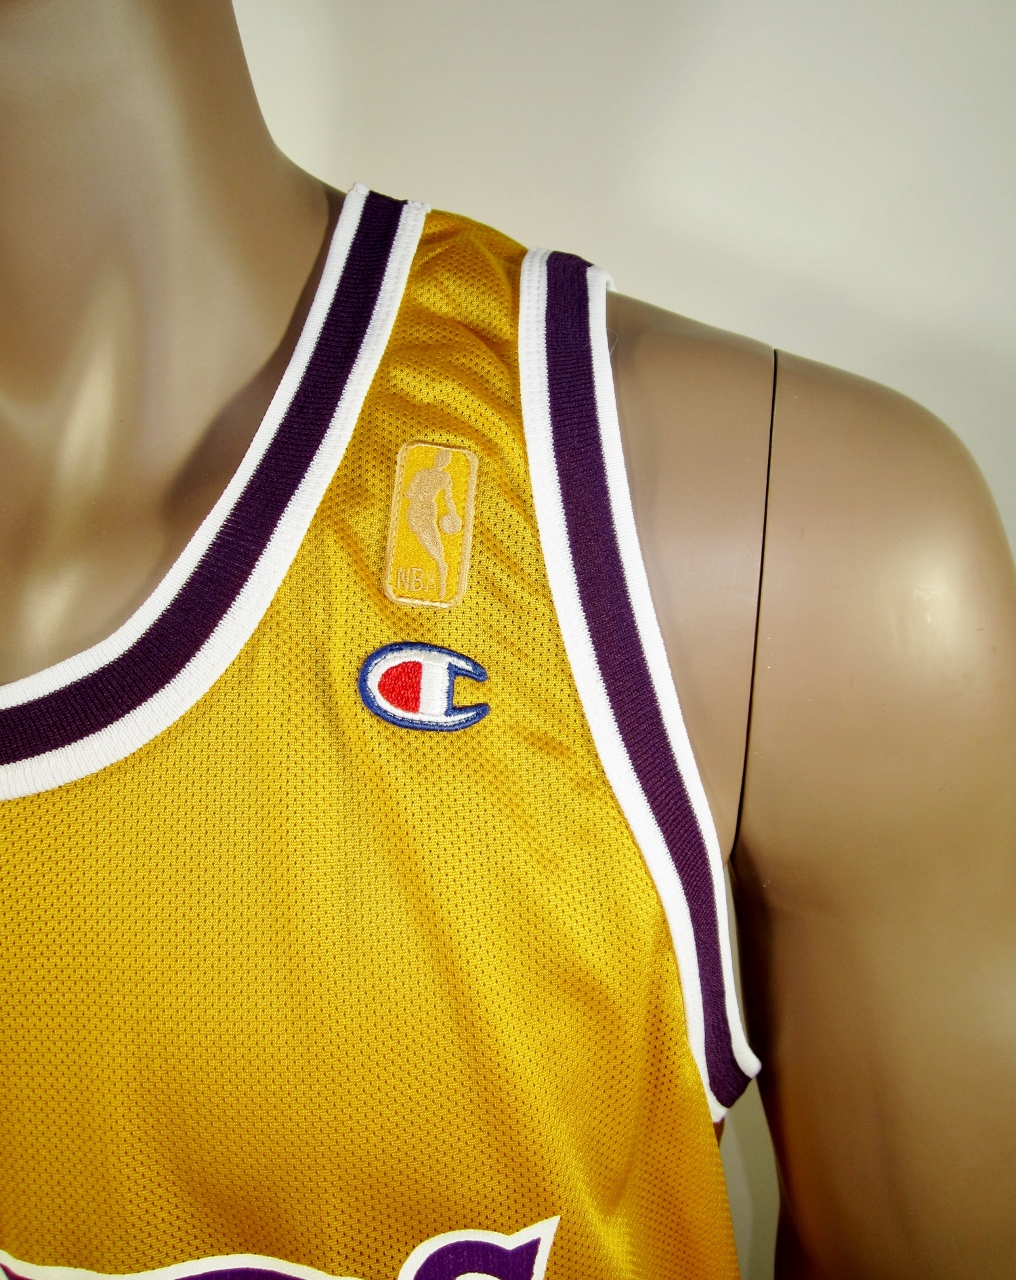 5fcf1f952e7 ... Wilt Chamberlain Los Angeles Lakers NBA 50 Gold logo Champion Jersey NWT  - Thumbnail 3 ...